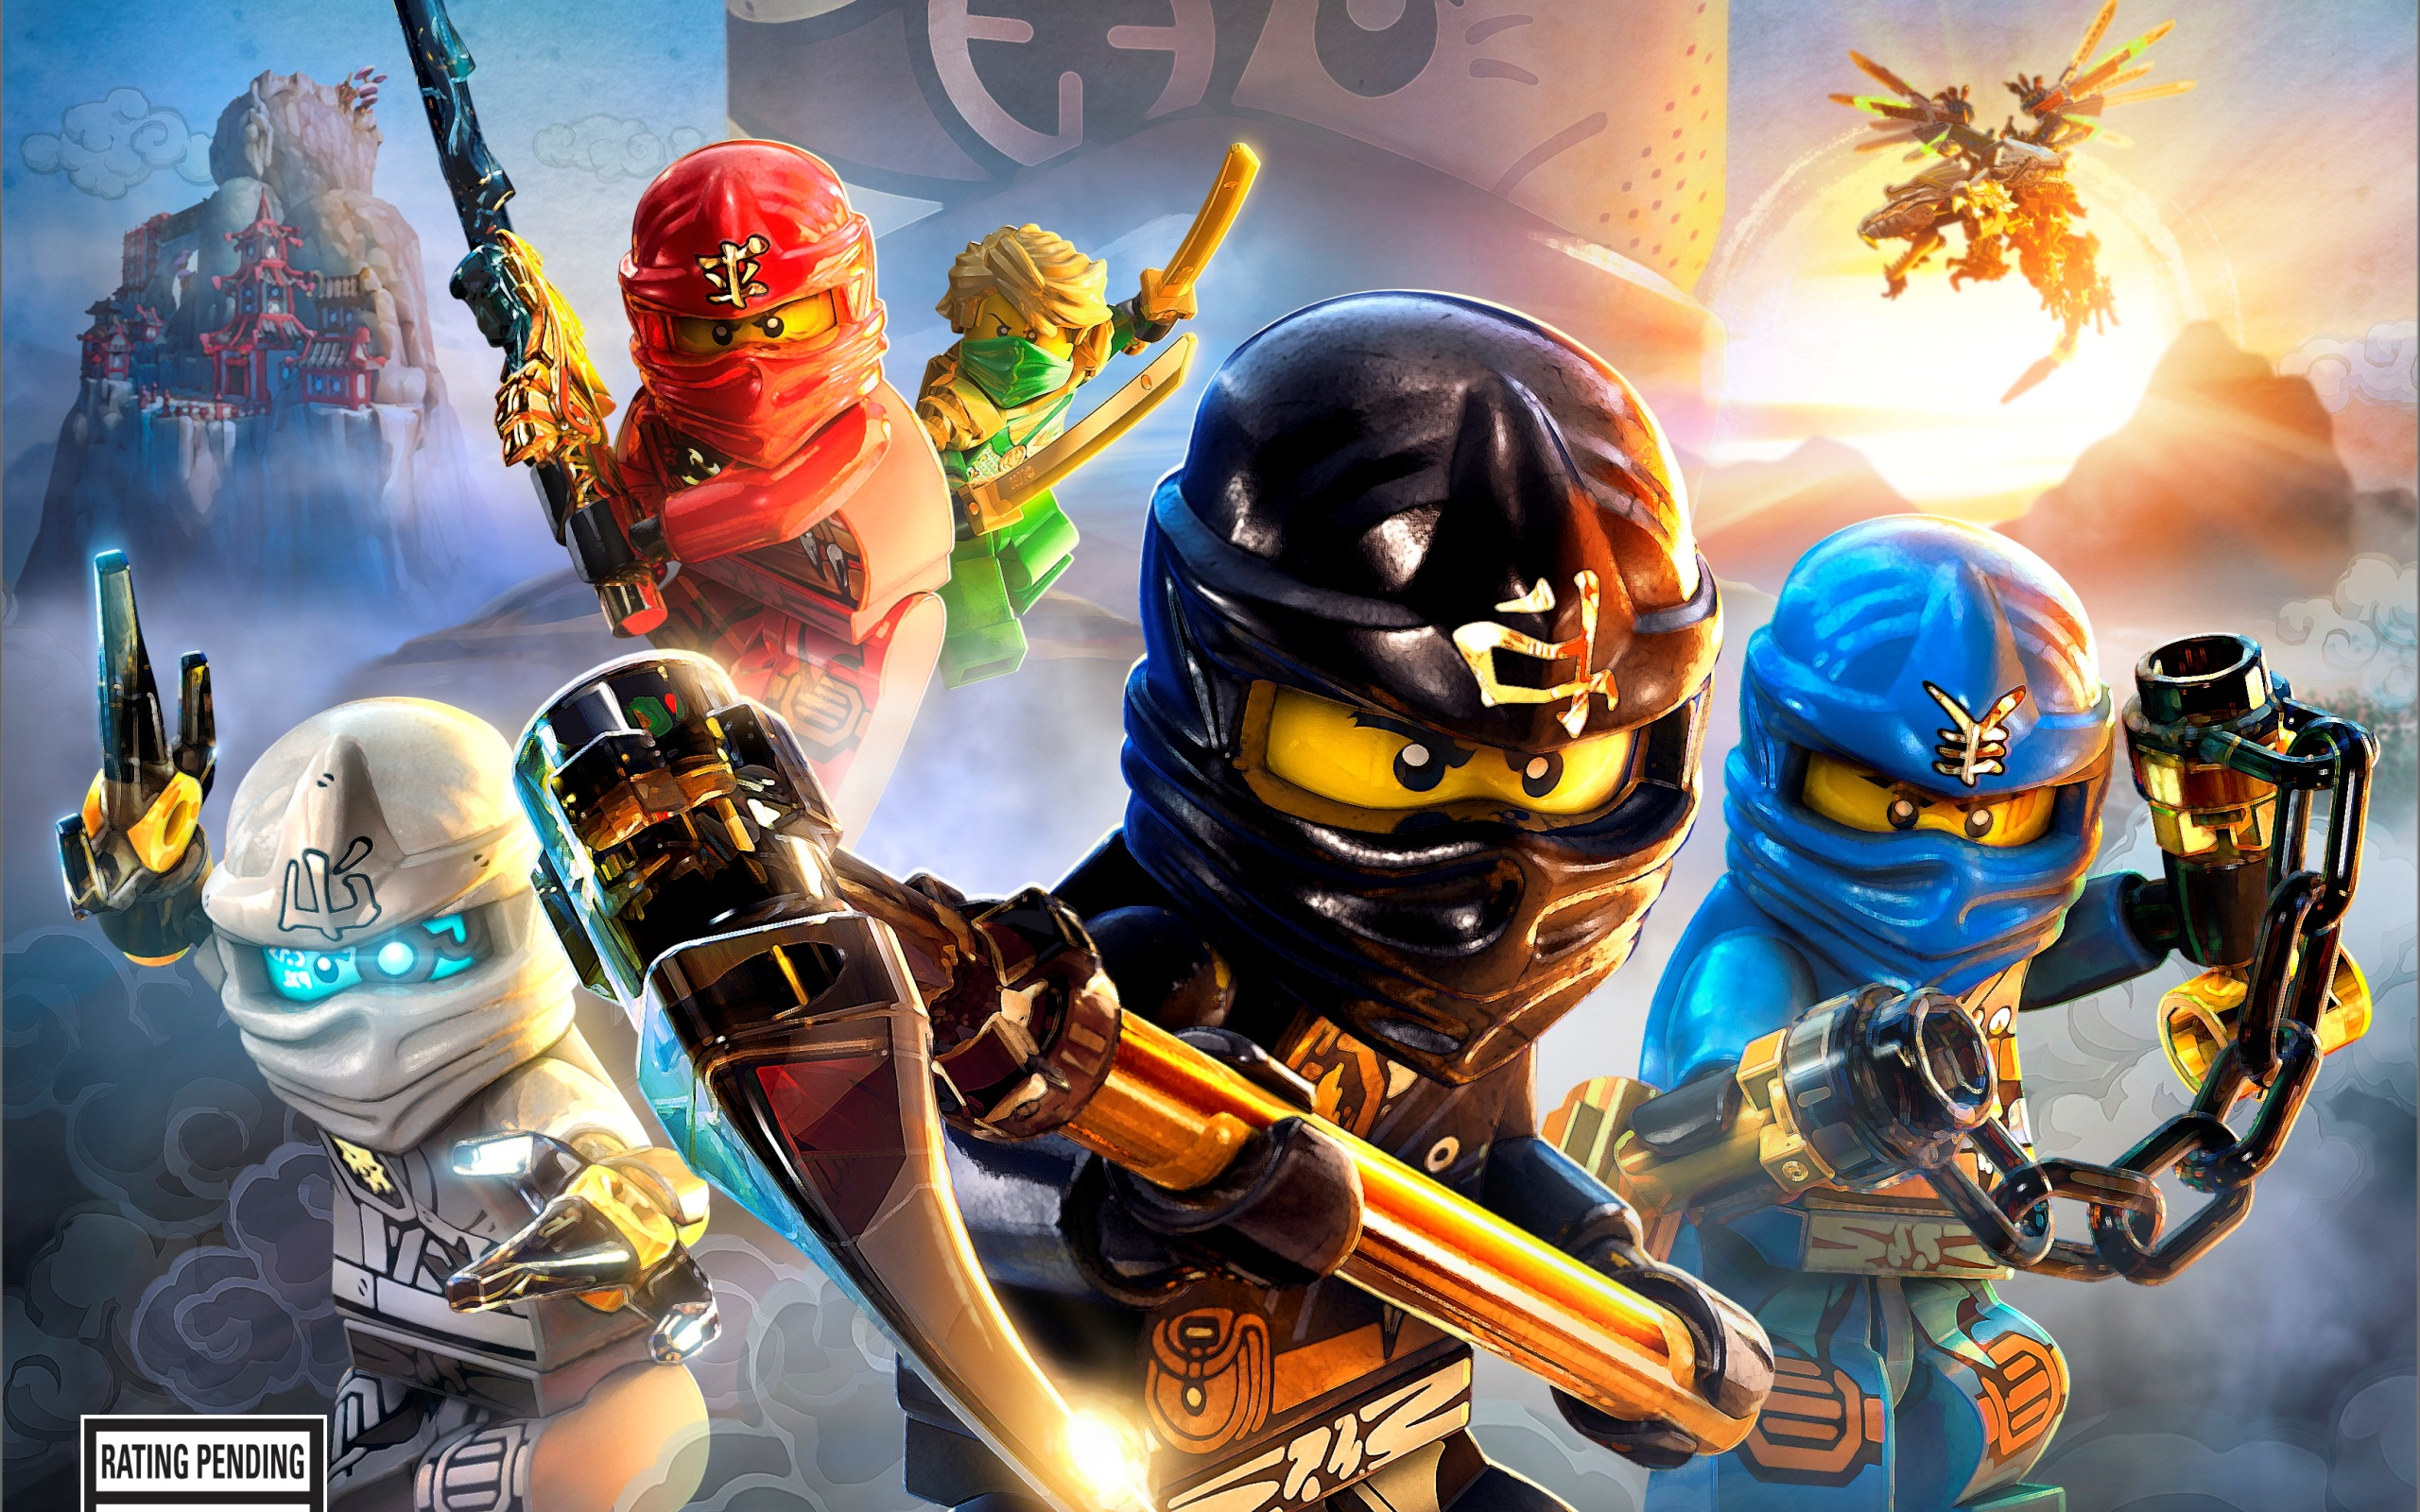 LEGO Ninjago Wallpaper - WallpaperSafari